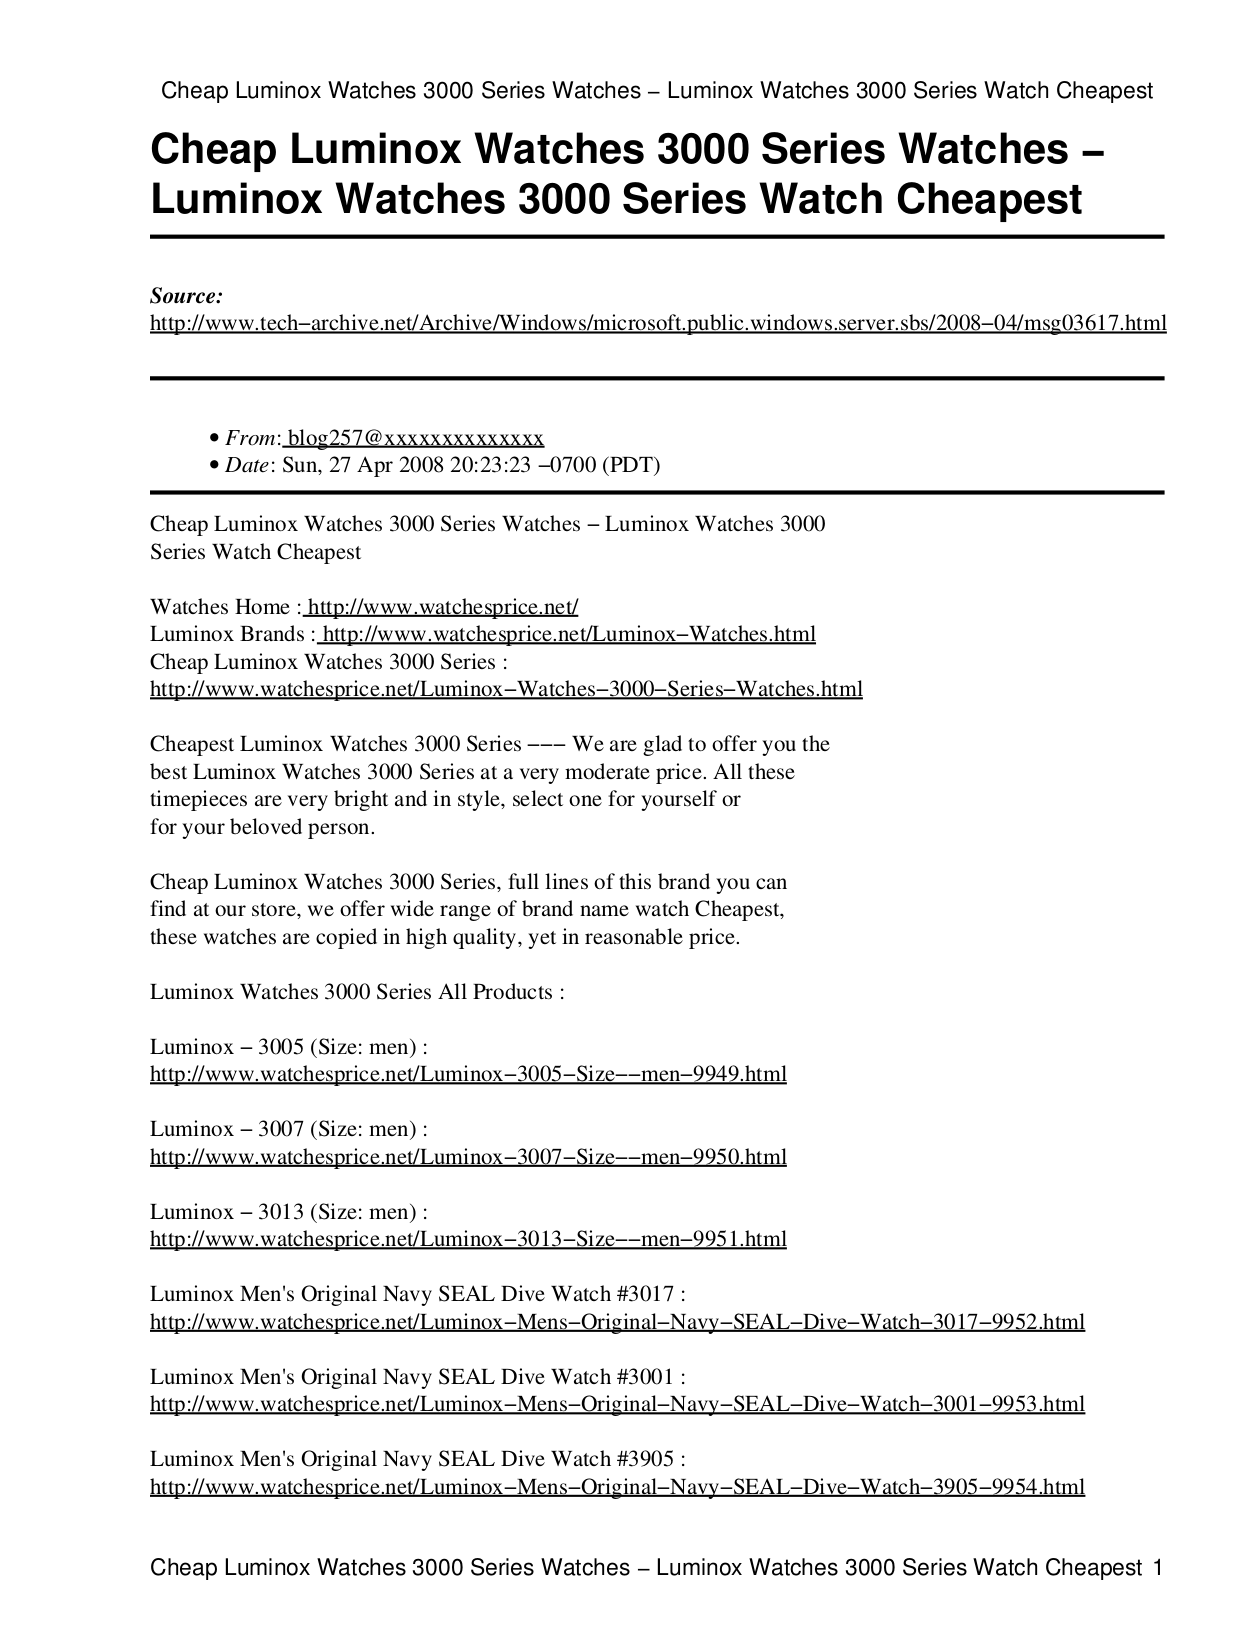 pdf for Luminox Watch Navy SEAL 3905 manual